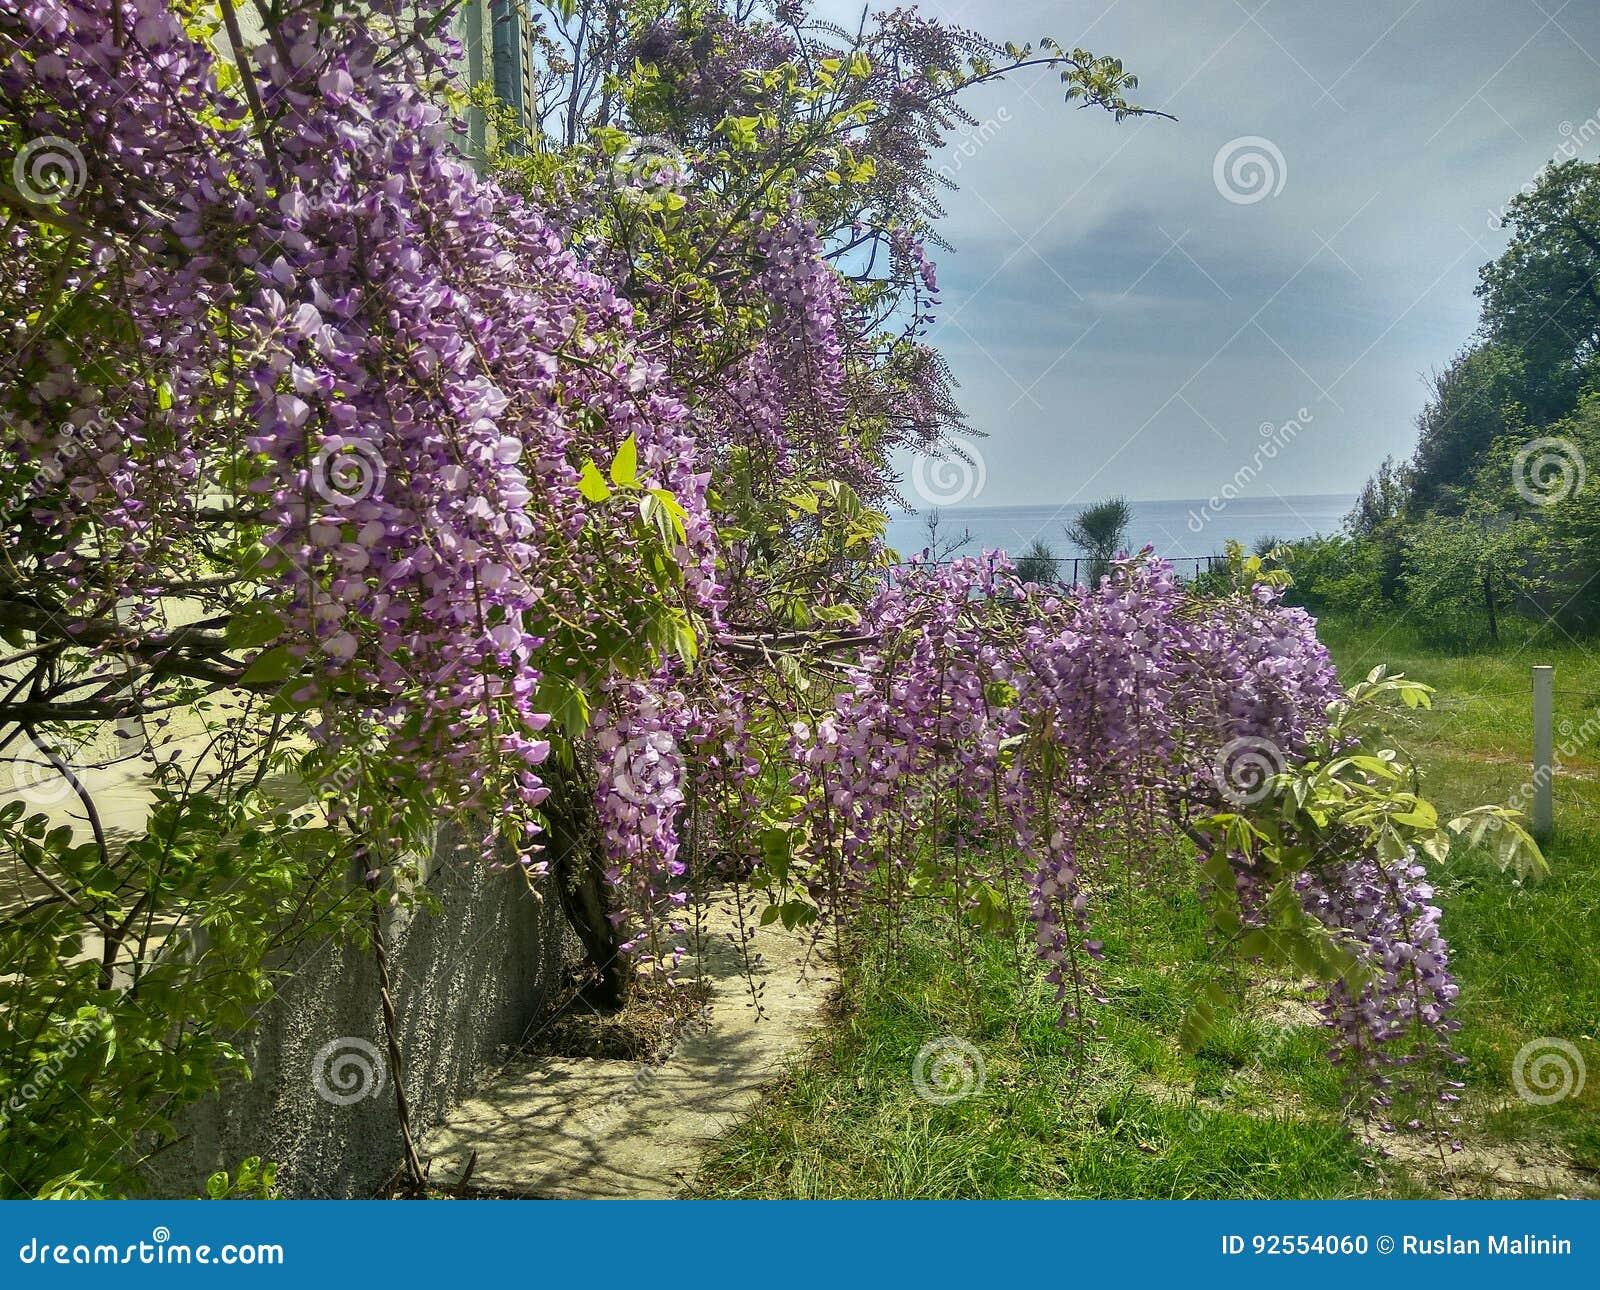 Primavera, città di Gelendzhik, montagne, mare, fiori, sole, bellezza